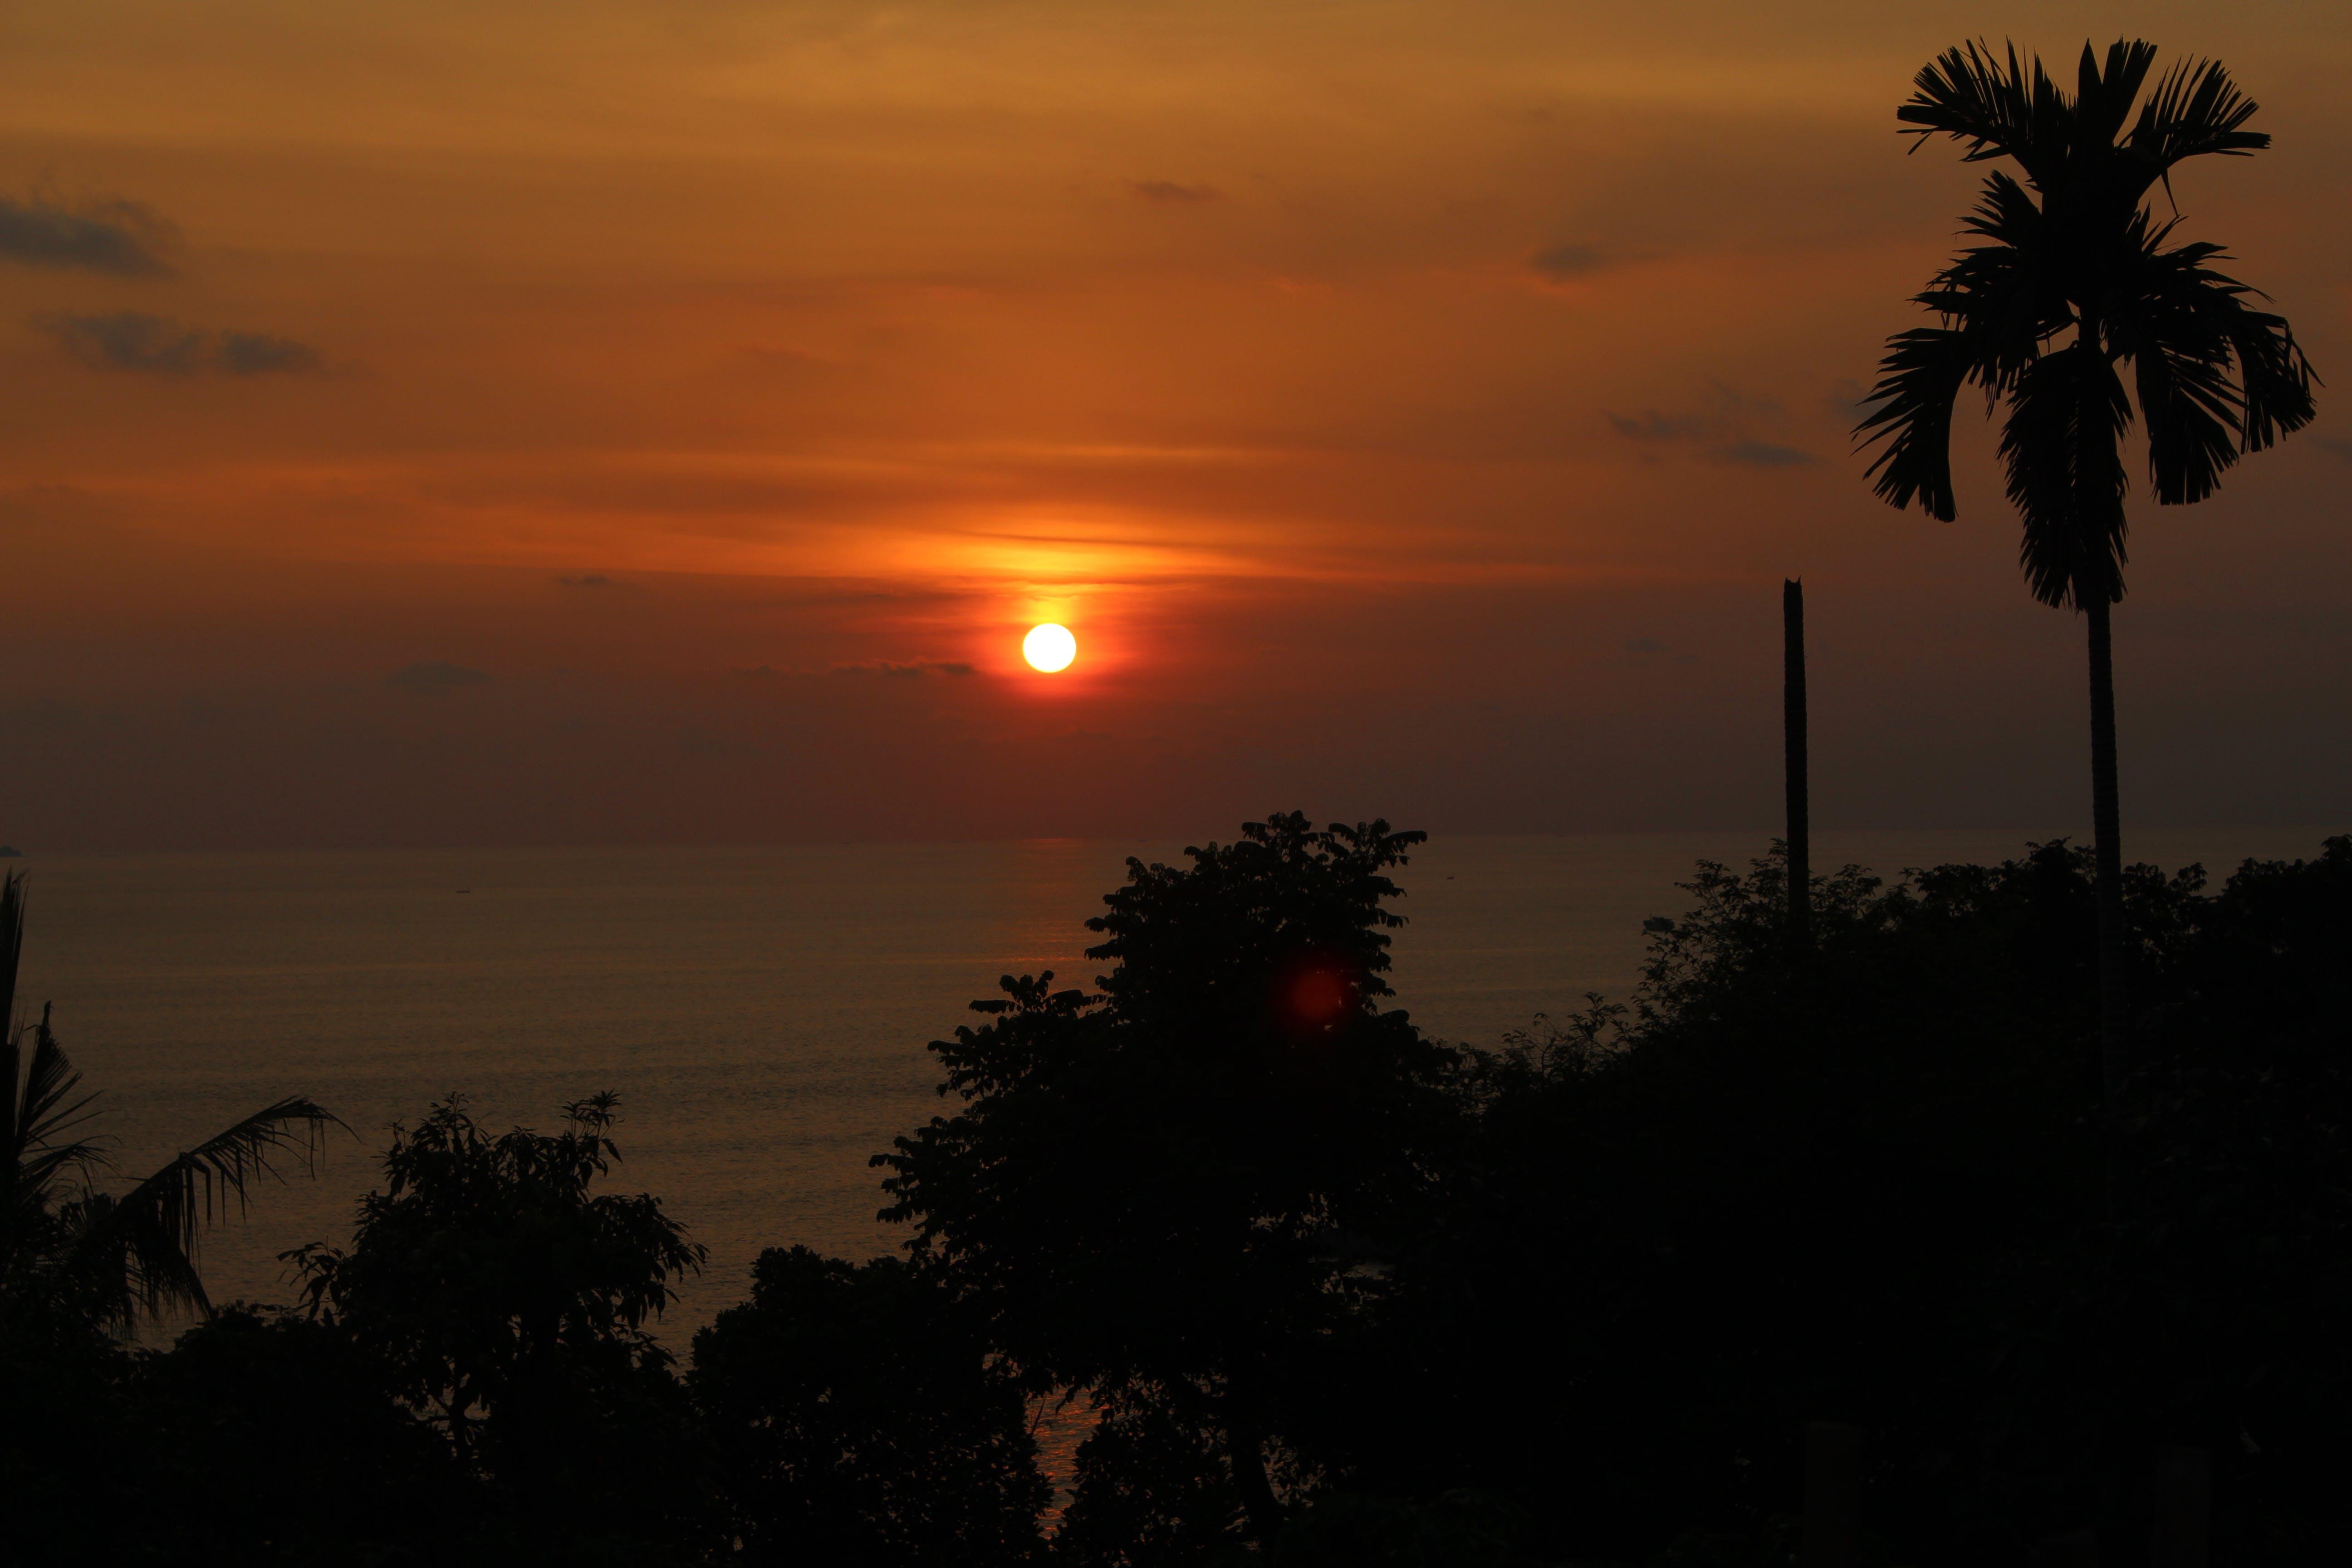 Free stock photo of #landscape #sunset, #nature, landscape